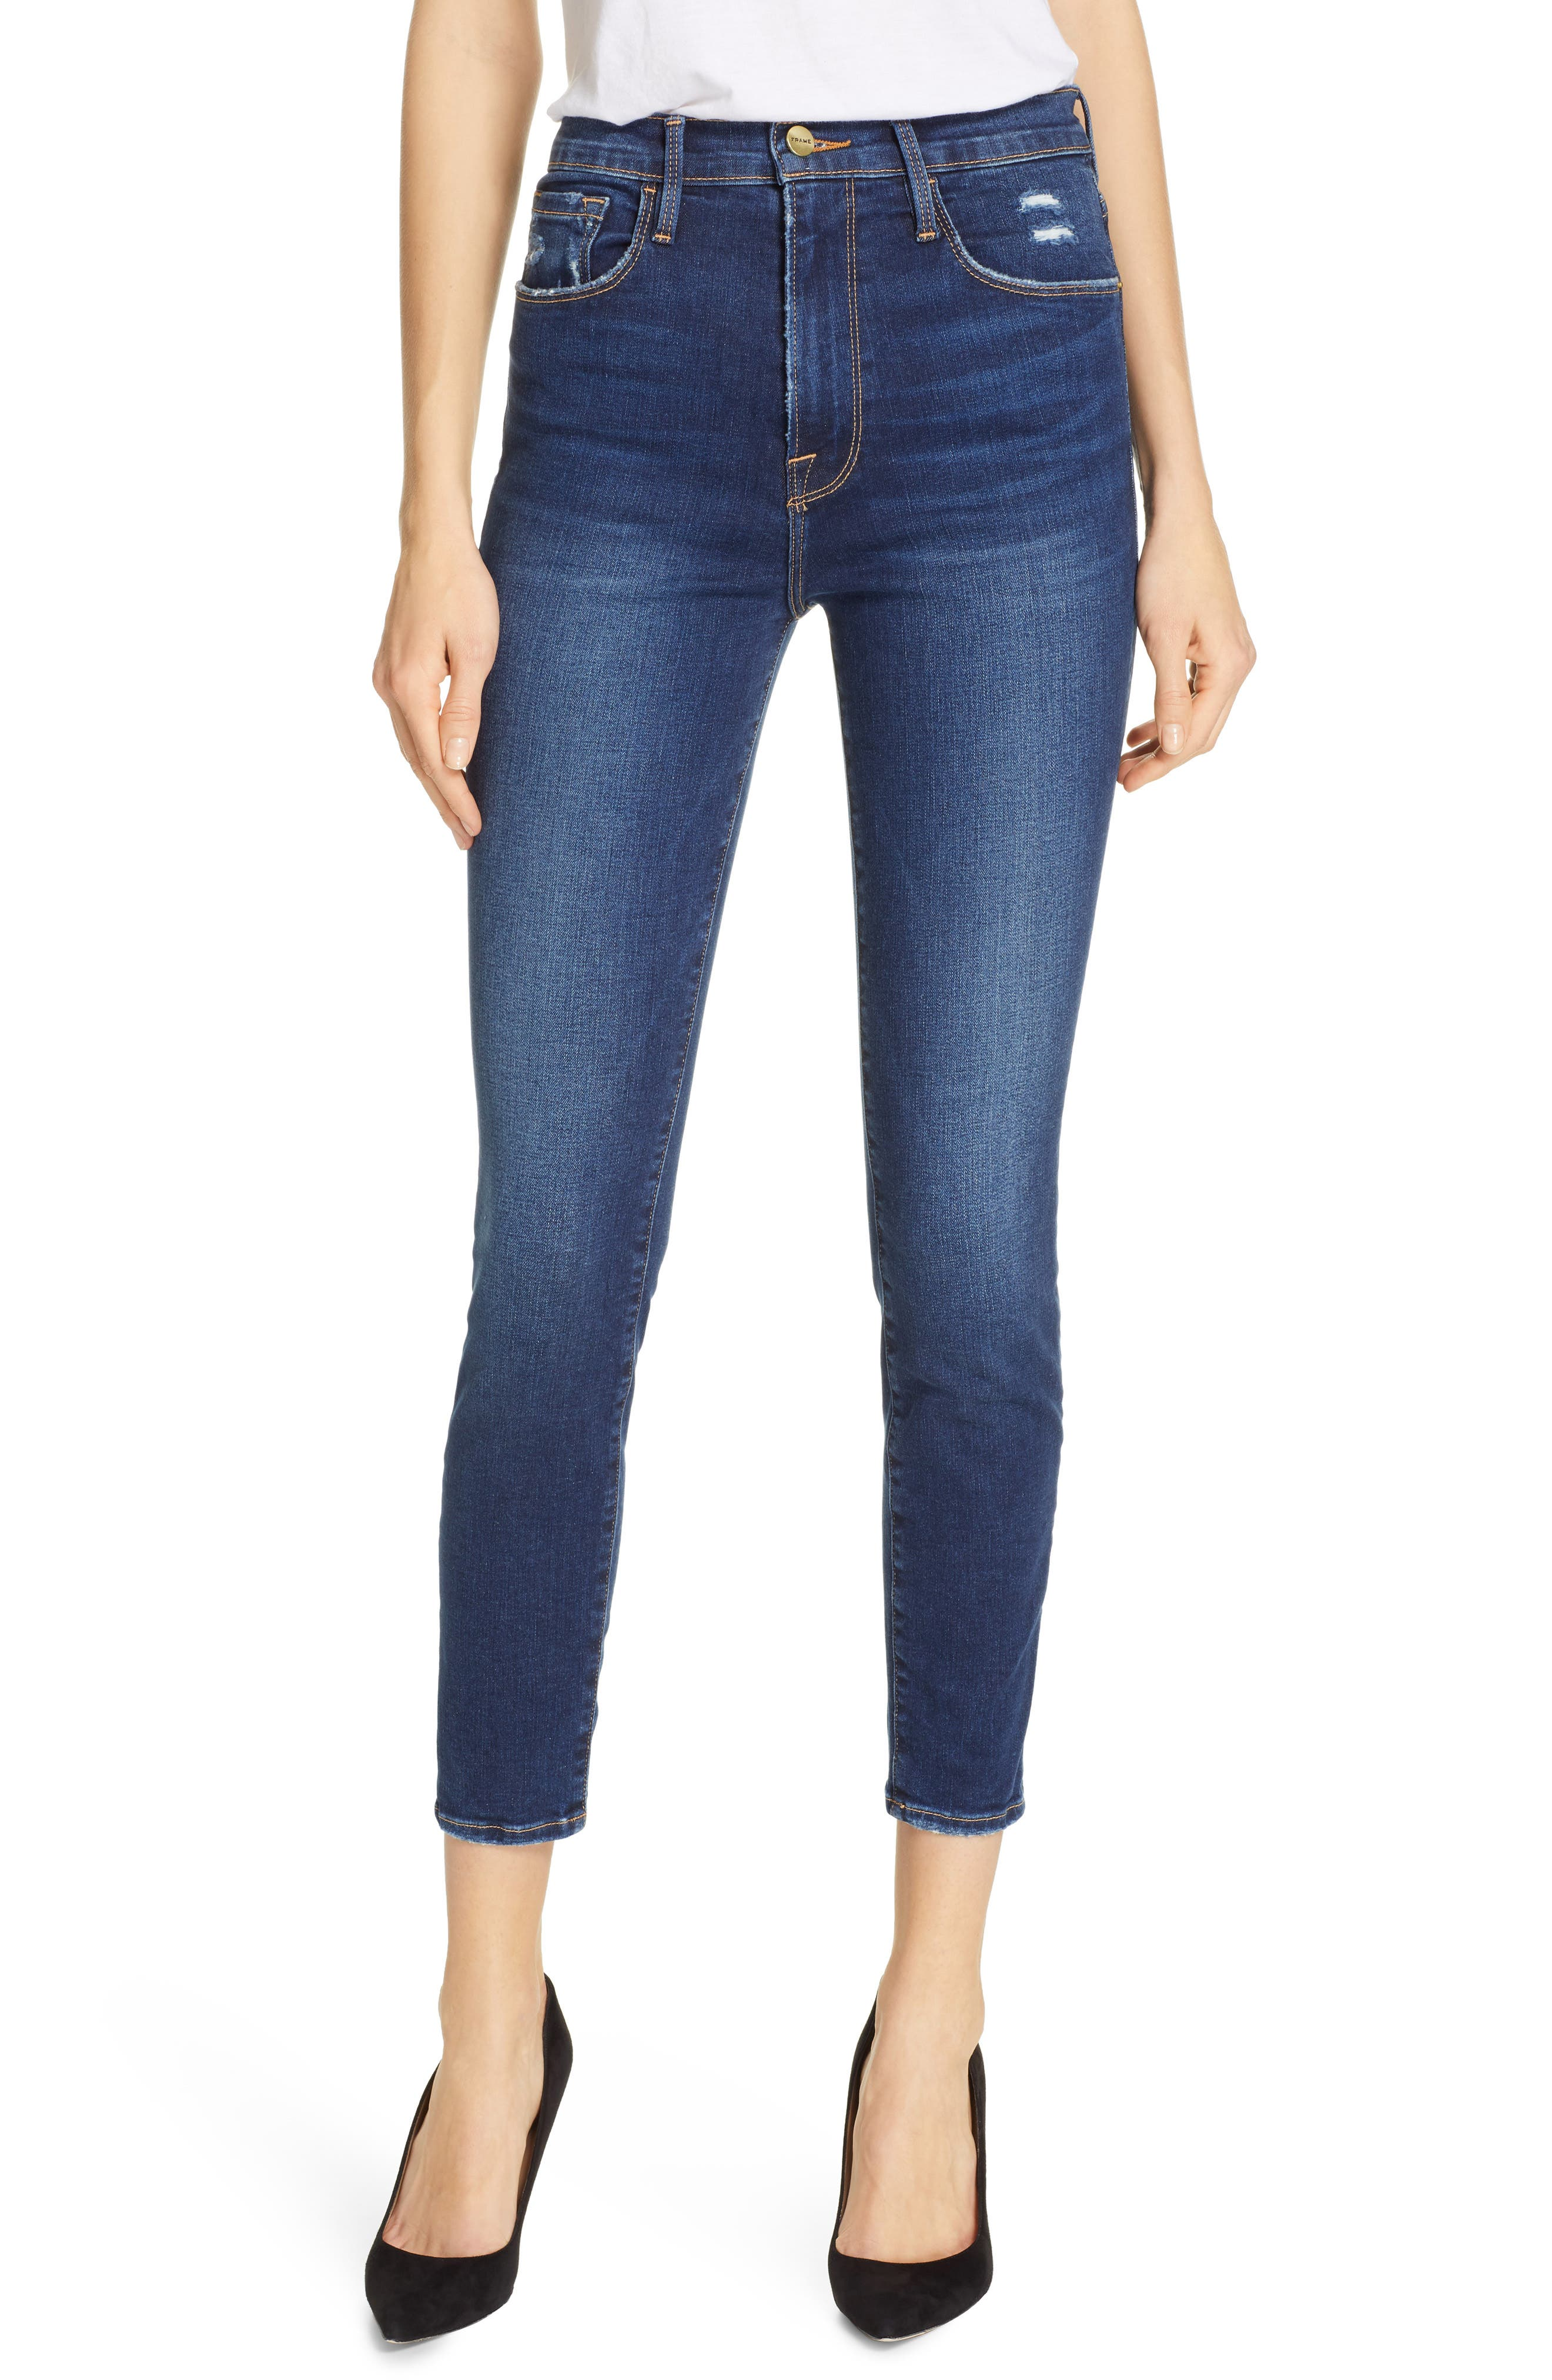 FRAME, Ali High Waist Crop Cigarette Skinny Jeans, Main thumbnail 1, color, MANO